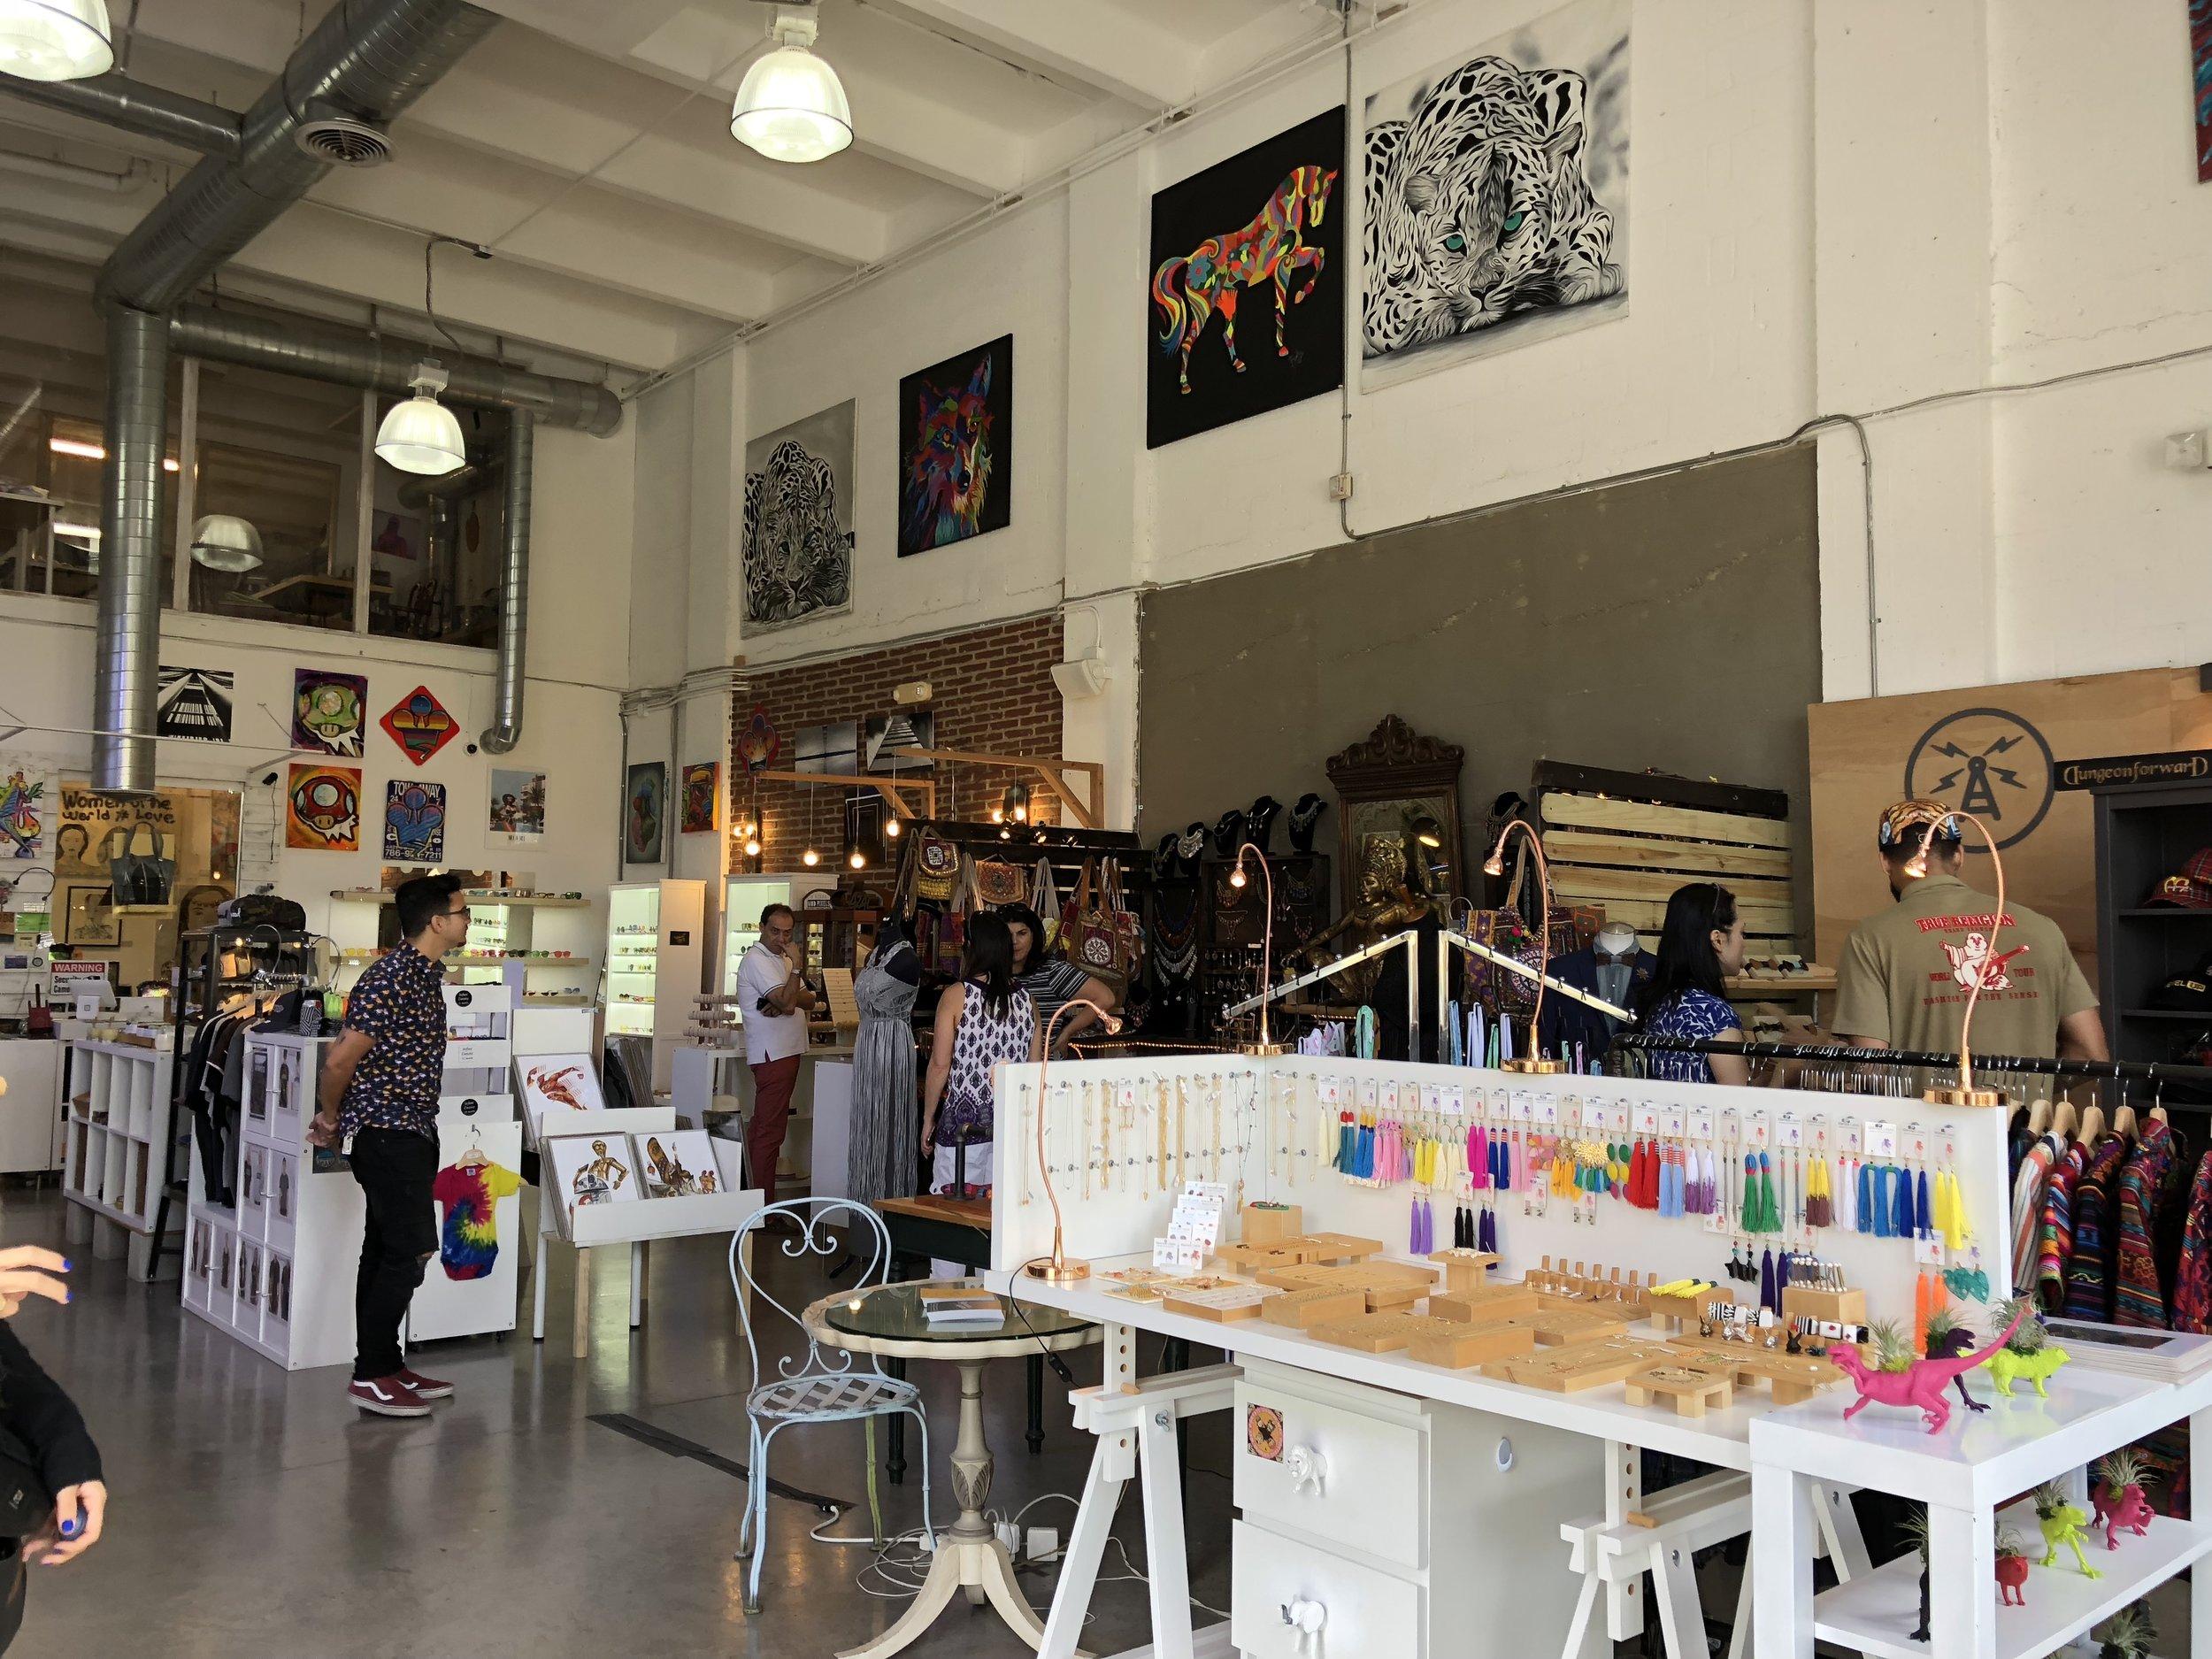 Artisan market in Wynwood